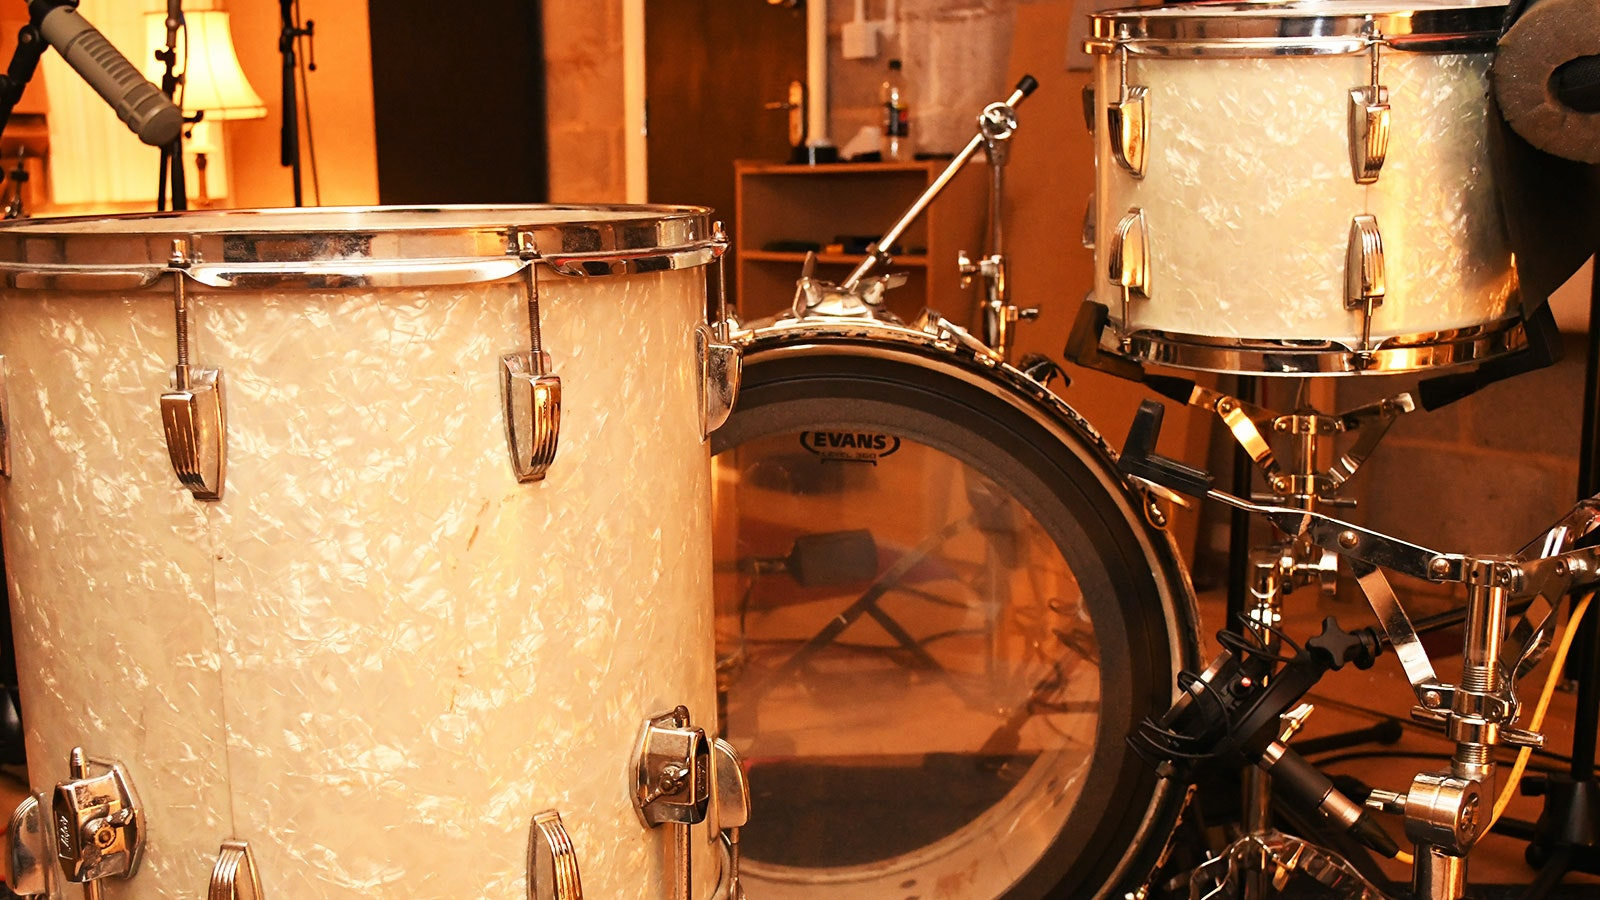 Superfly Drums - £24 - Unorthodox Audio